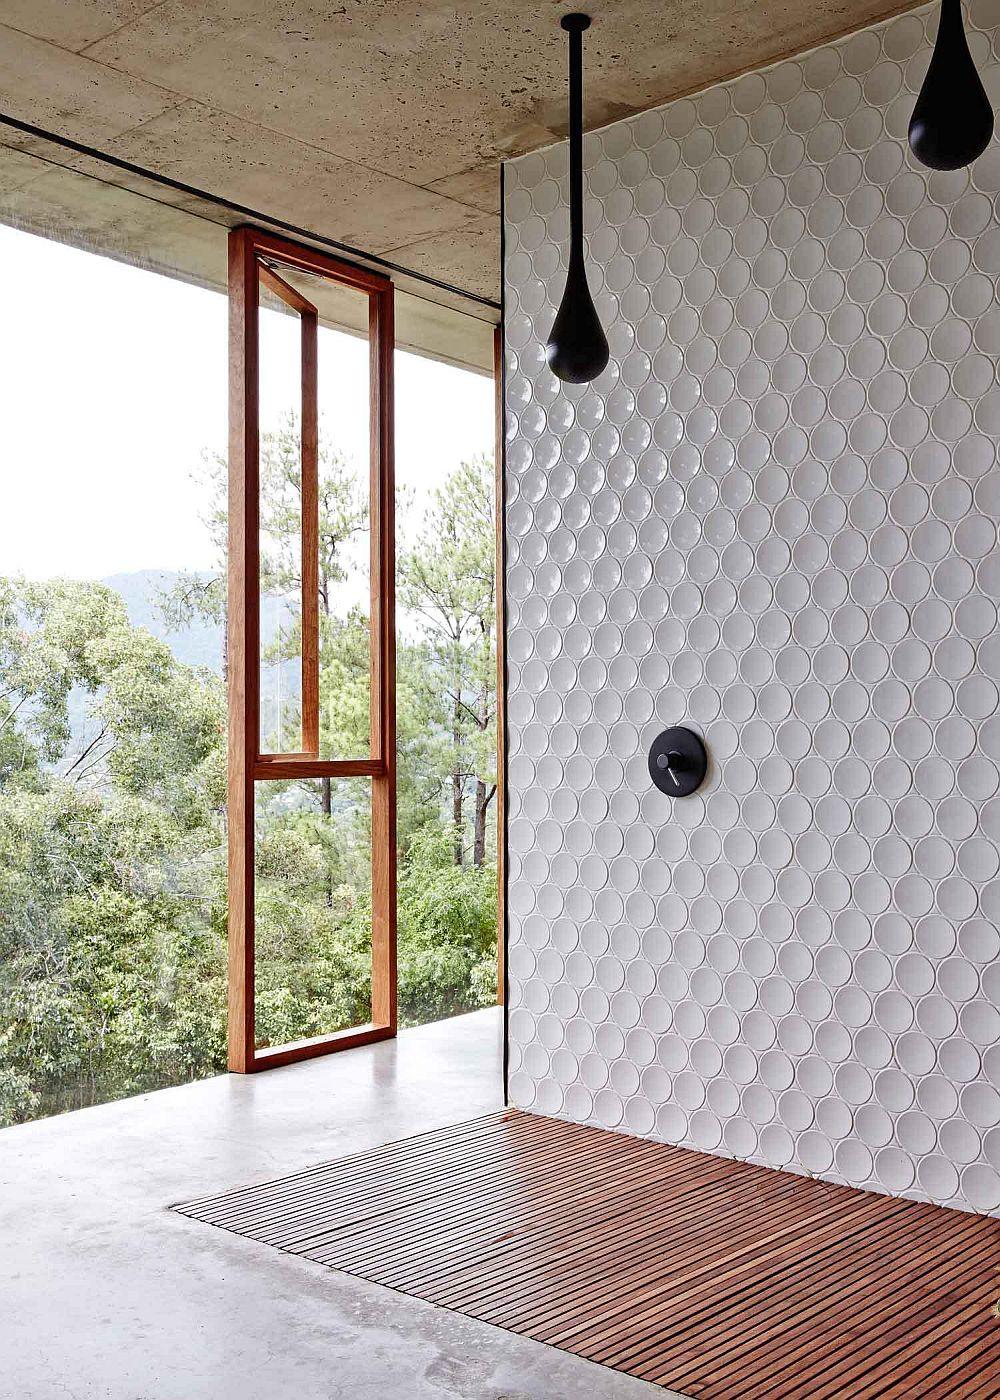 adelaparvu.com despre casa din beton si sticla, Planchonella House, arhitect Jesse Bennet, Foto Sean Fennessy (27)